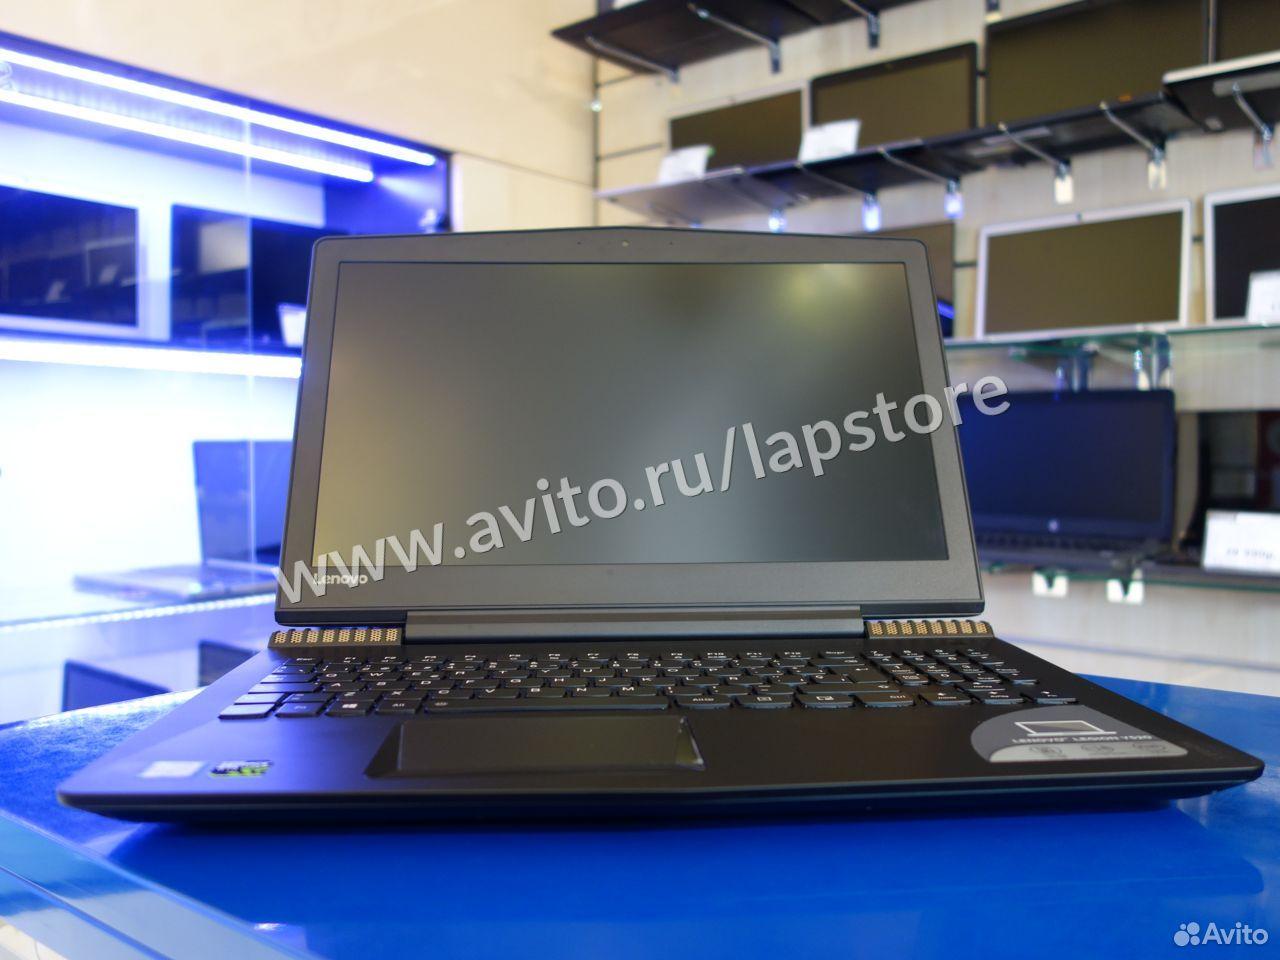 Ноутбук Lenovo Y520 i7-7700HQ/16GB/256+1T/GTX1050  84012422018 купить 3